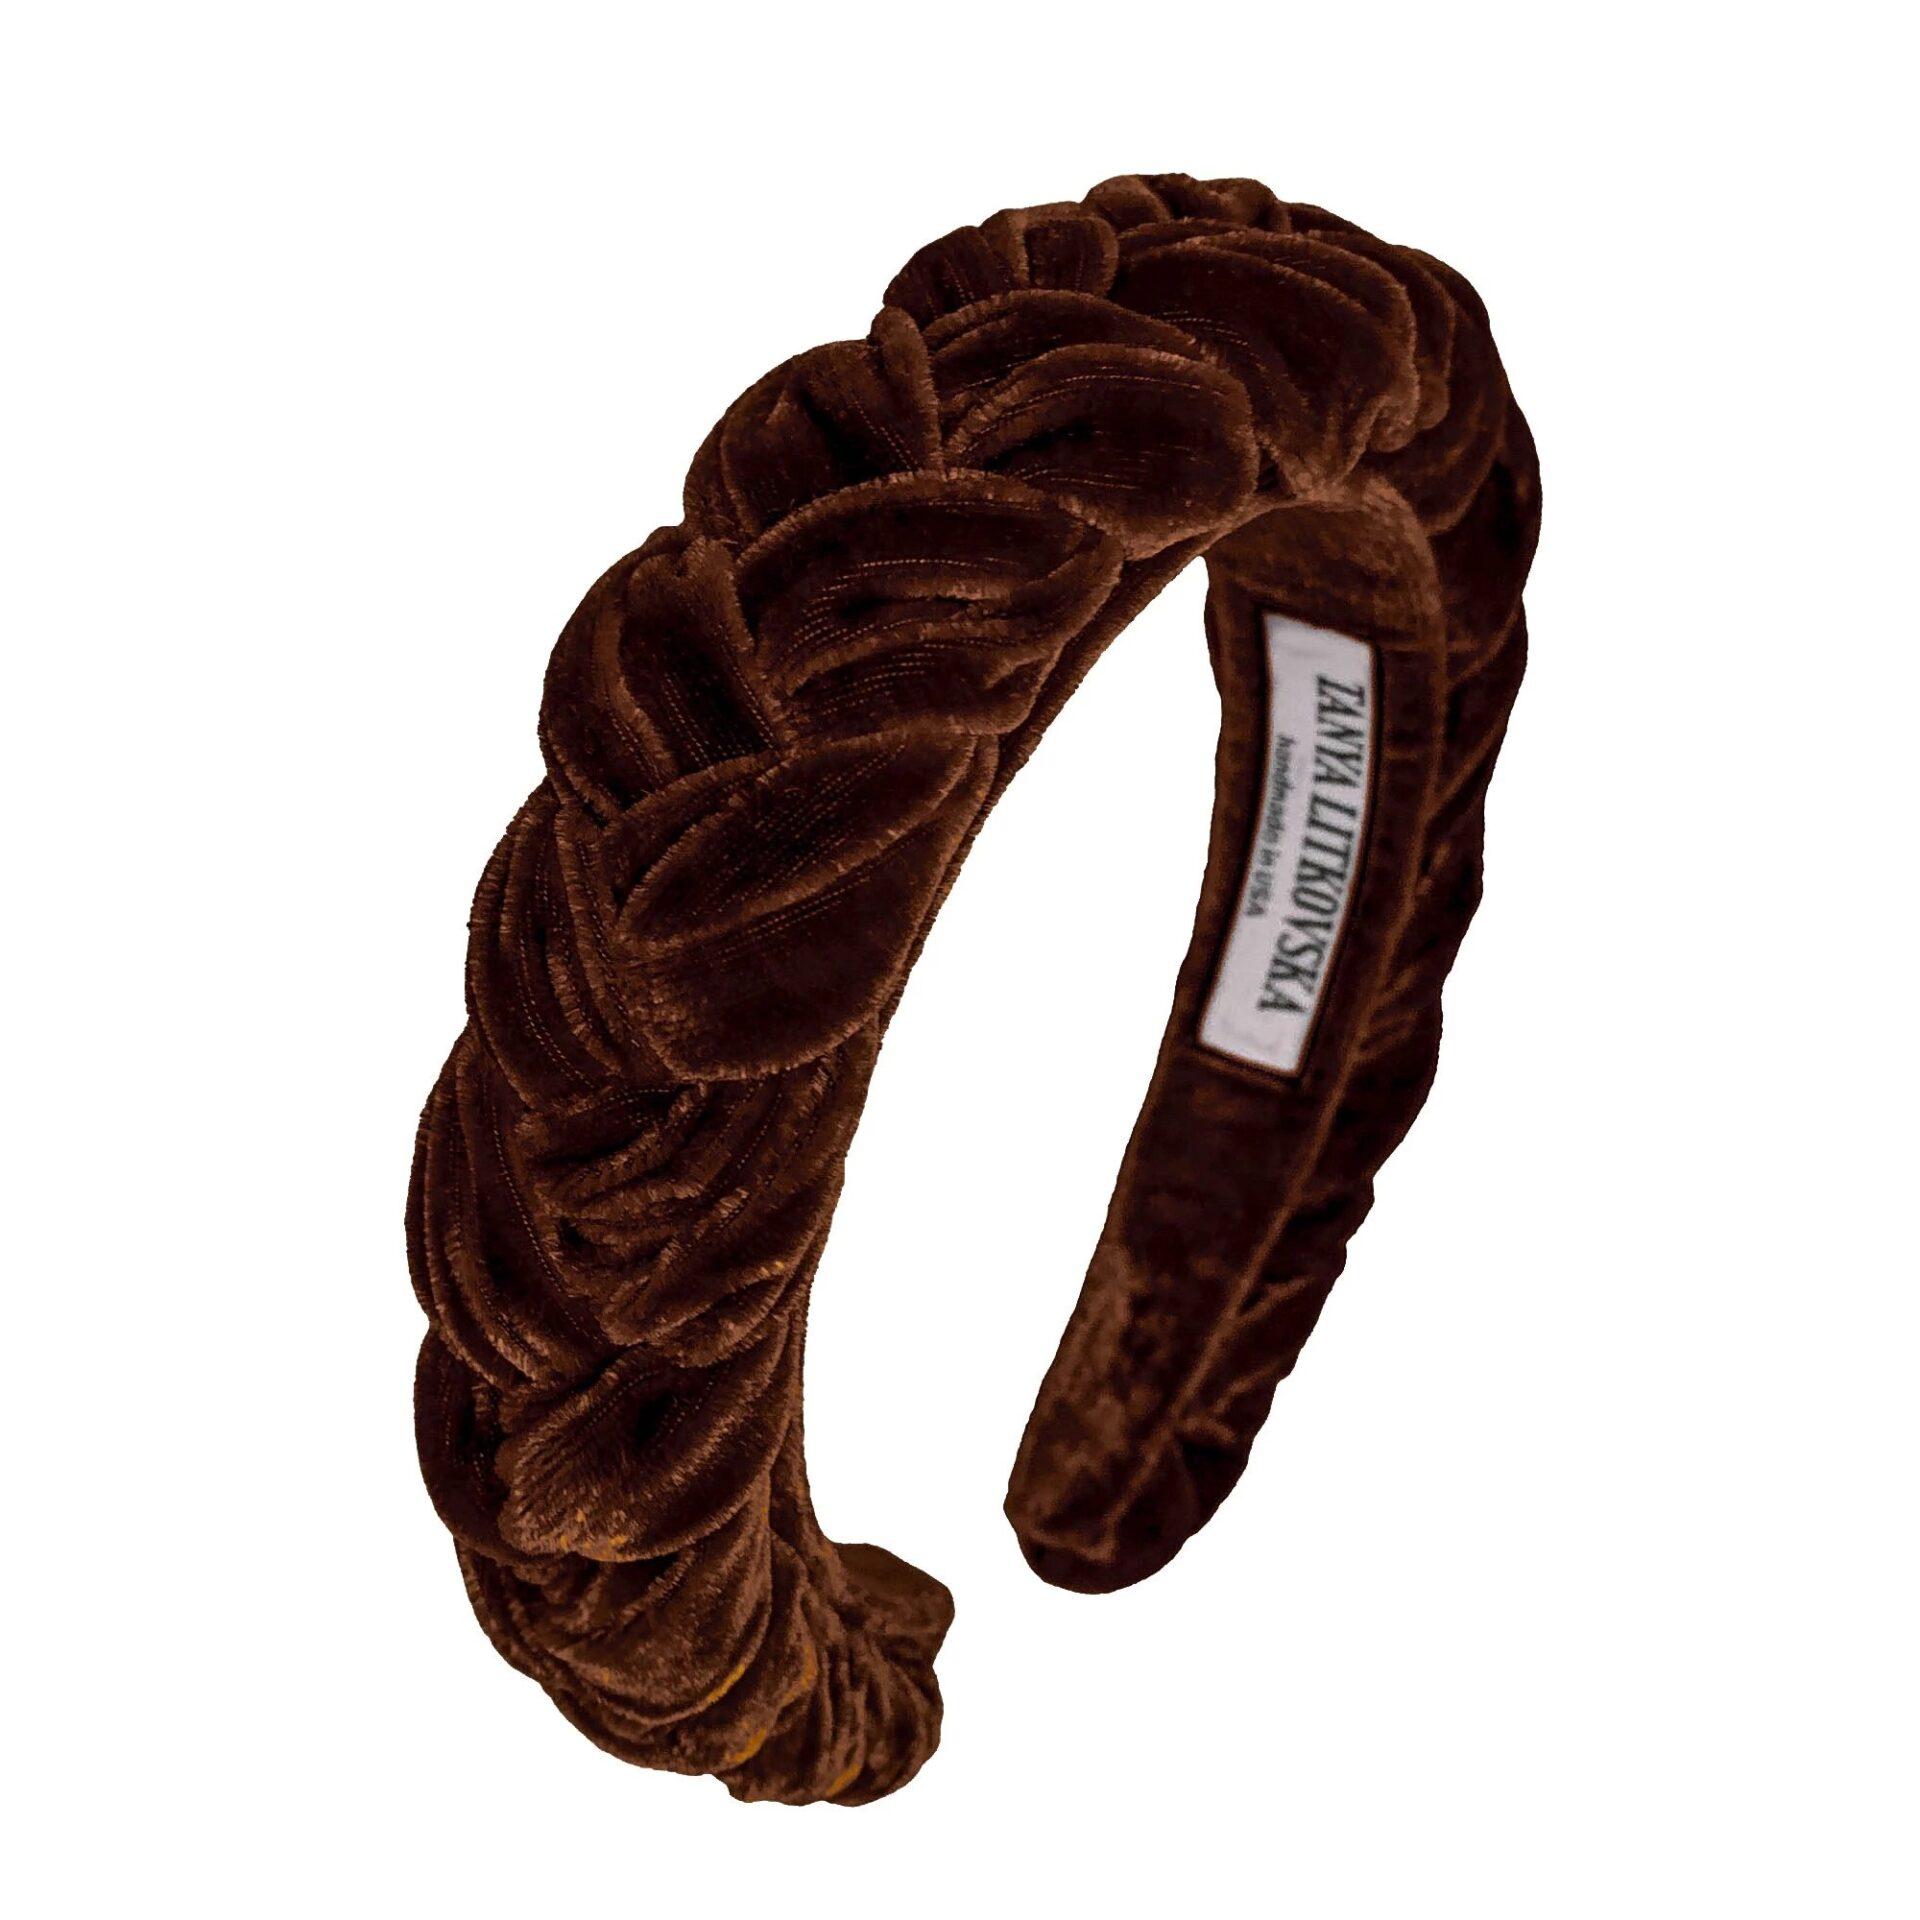 Tanya litkovska Women's Slim Velvet Headband in Chocolate